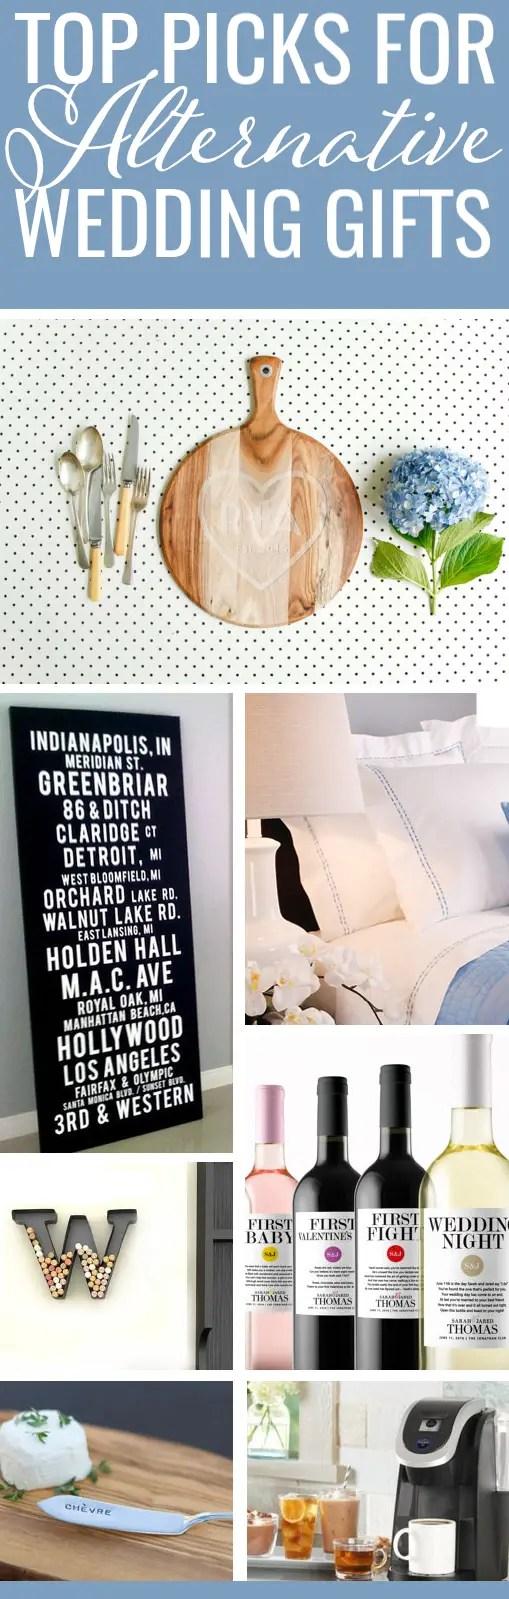 Alternative Wedding Gift Ideas: Top Picks to Inspire You